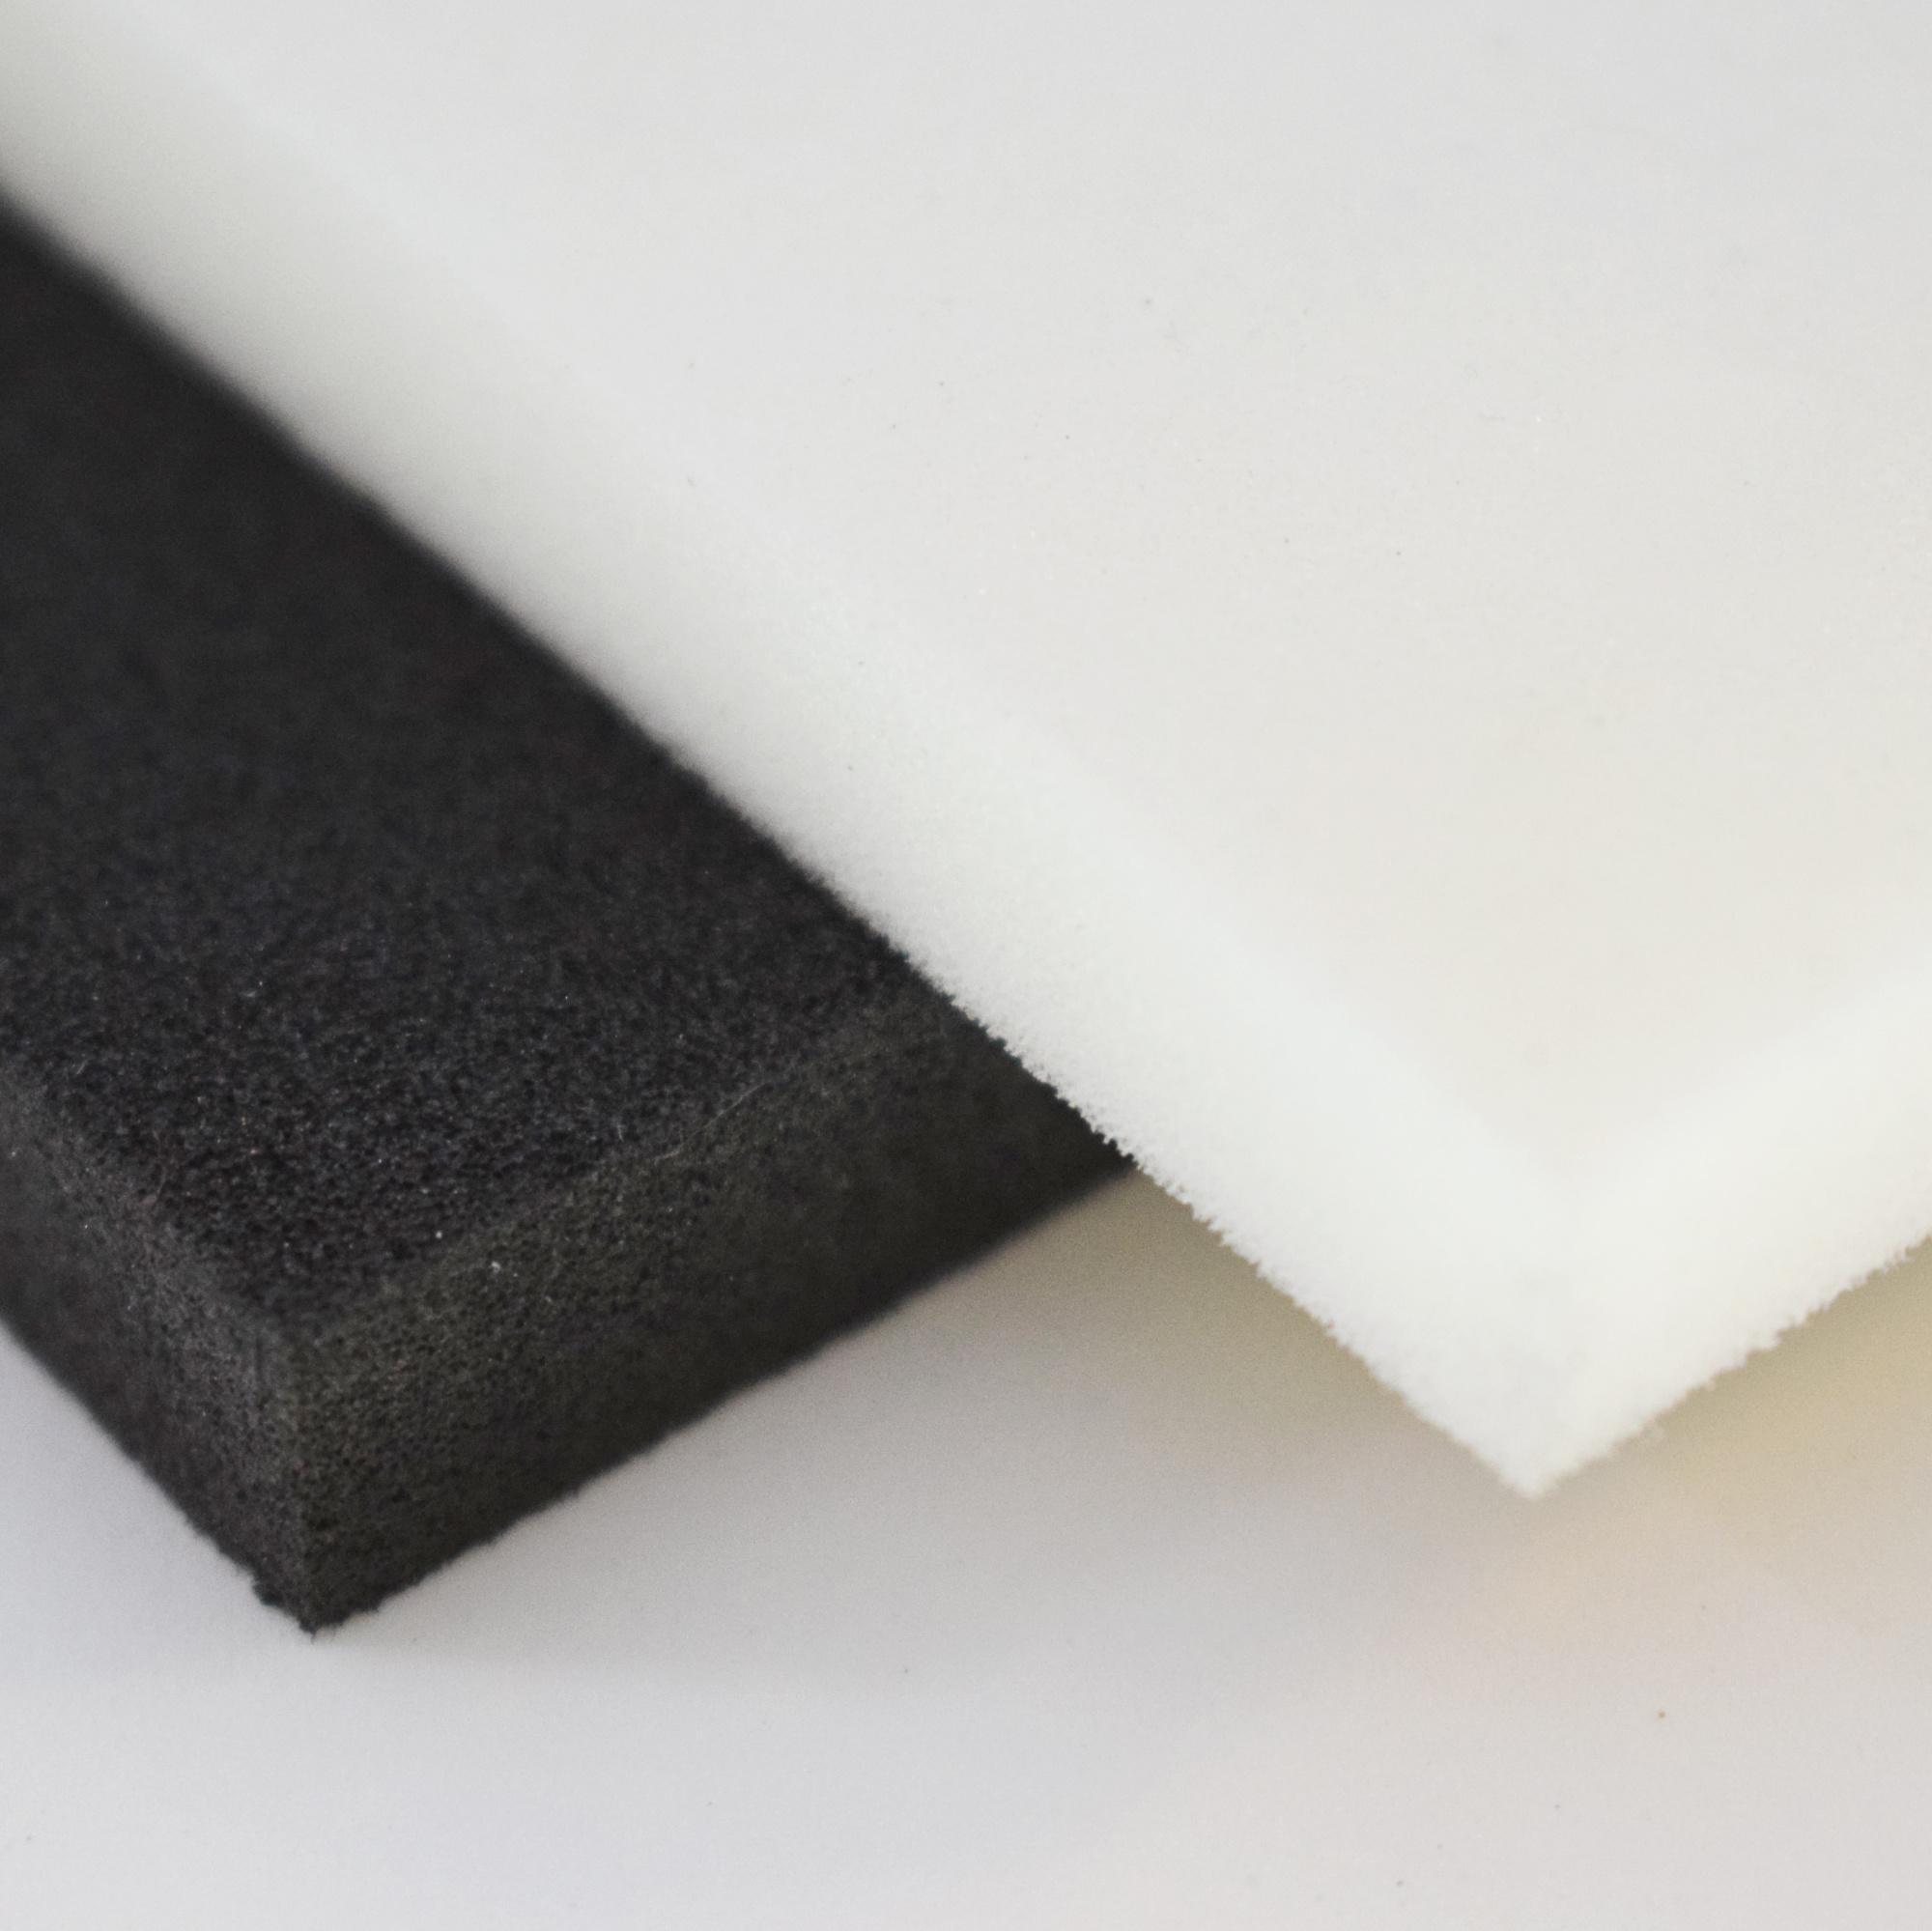 Plastazote Foam Products